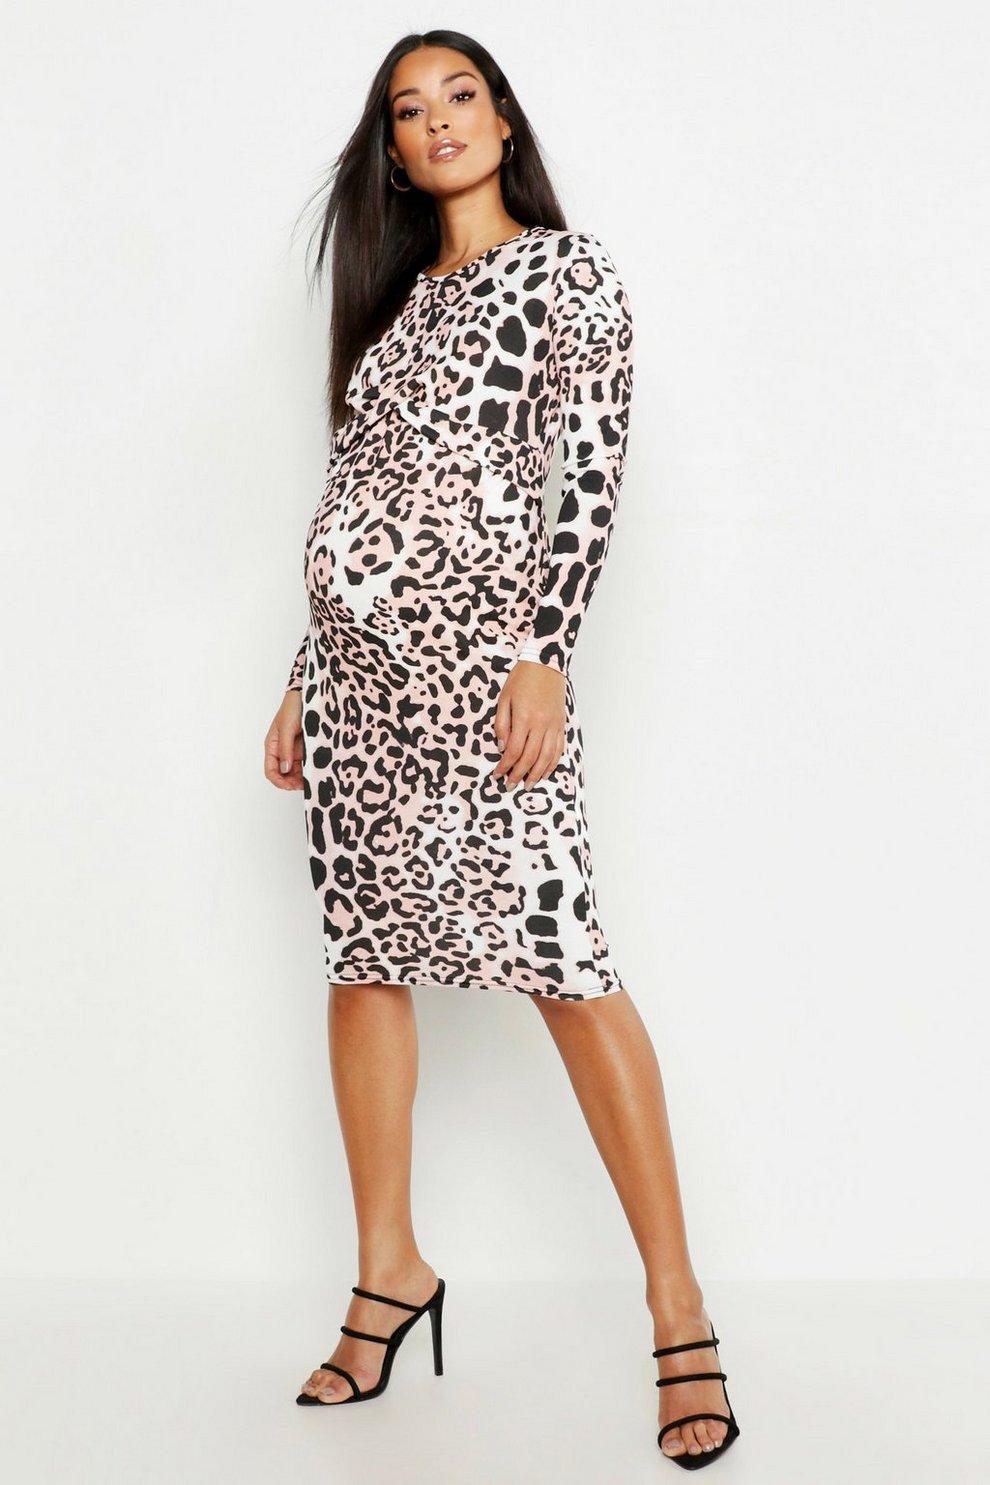 1afbfa7c70765 Womens Apricot Maternity Twist Front Bodycon Midi Dress